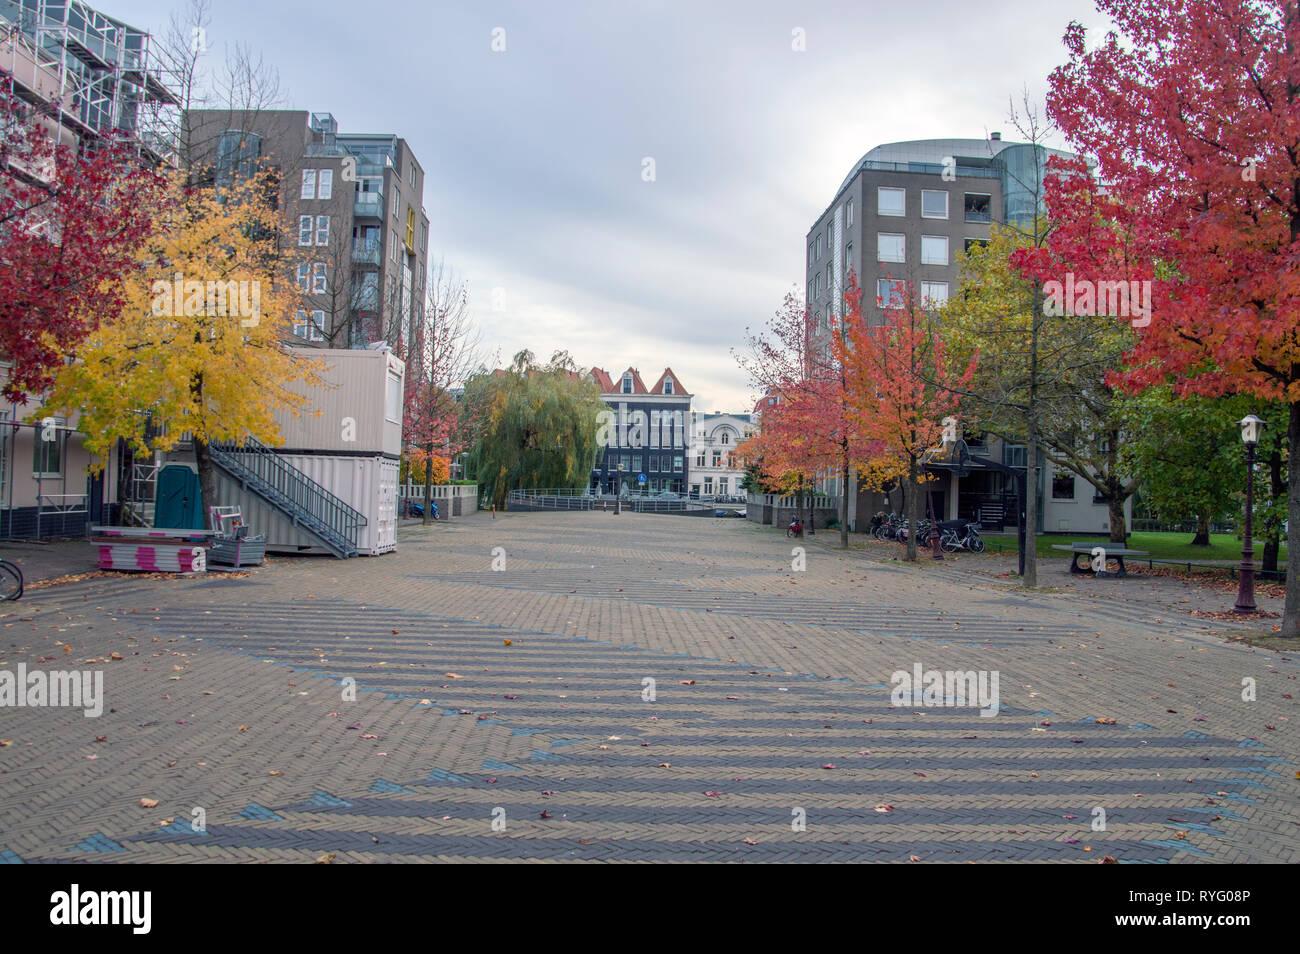 Wilhelmina Blombergplein Square At Amsterdam The Netherlands 2018 Stock Photo